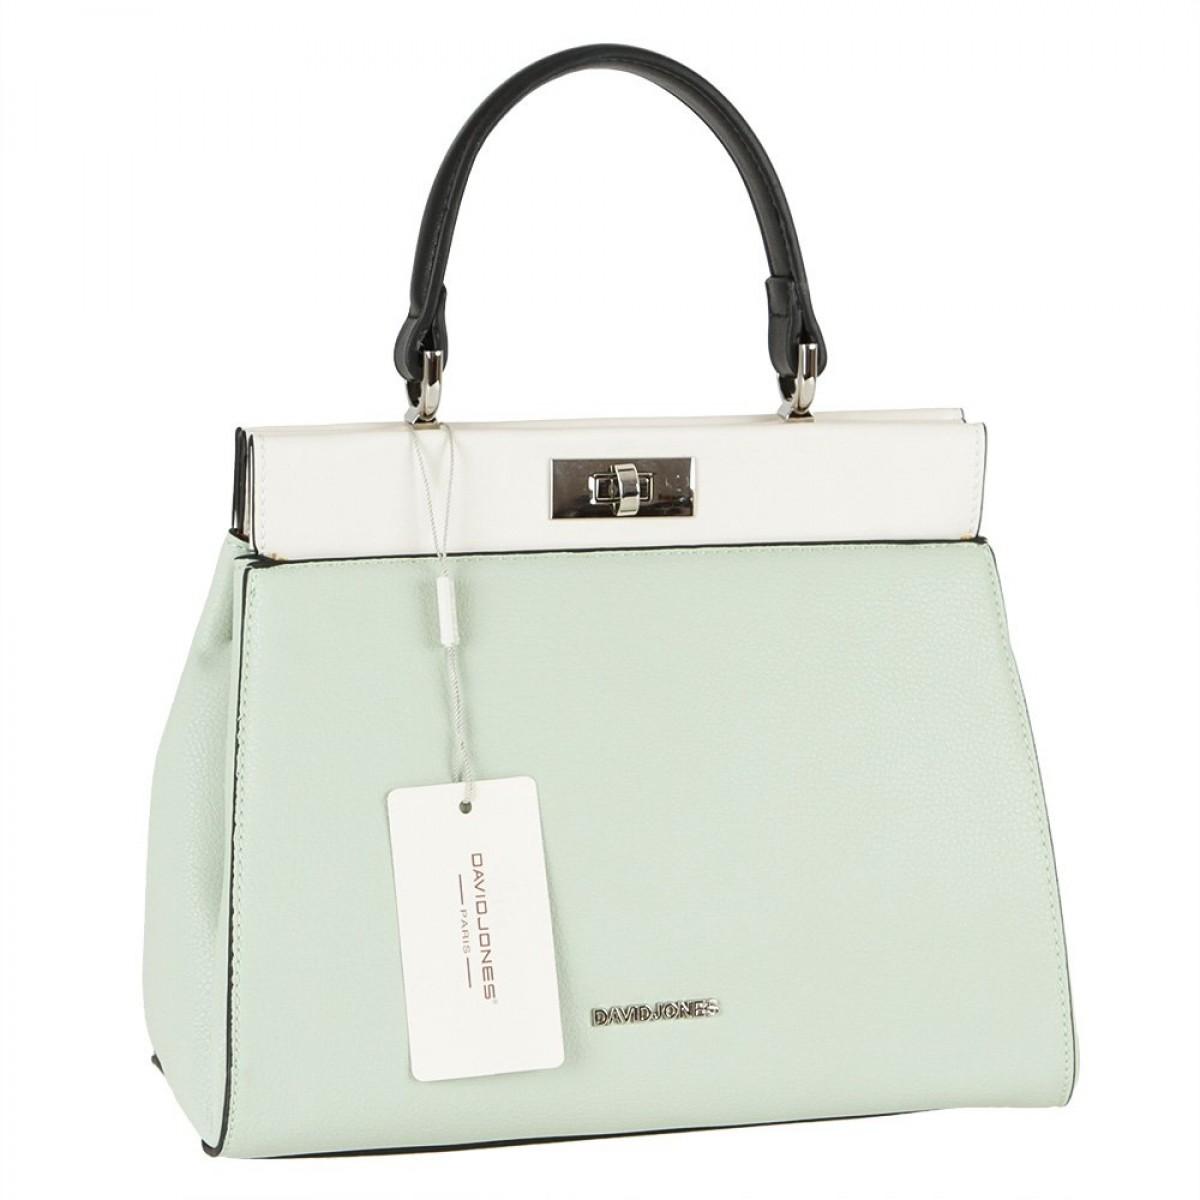 Жіноча сумка David Jones 6310-1 PALE GREEN